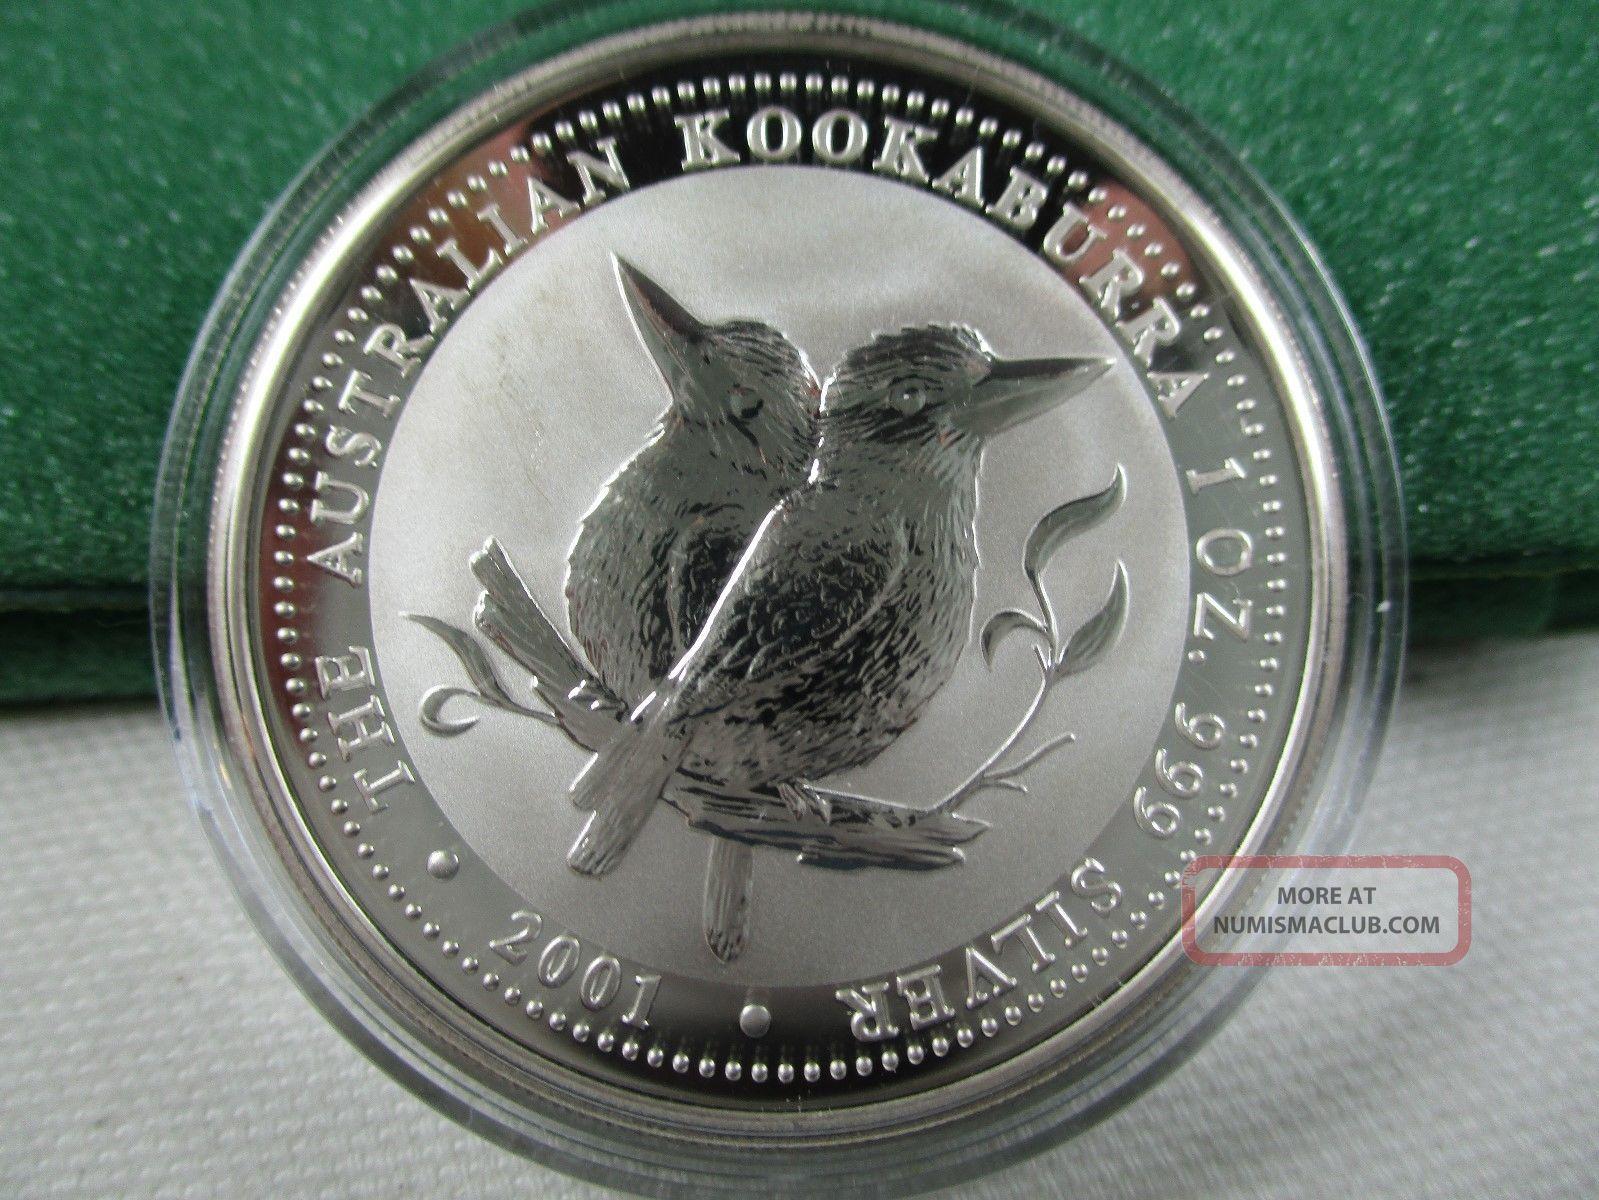 2001 Perth Australia Kookaburra 1 Ounce Silver Coin In Capsule - 2 Australia photo